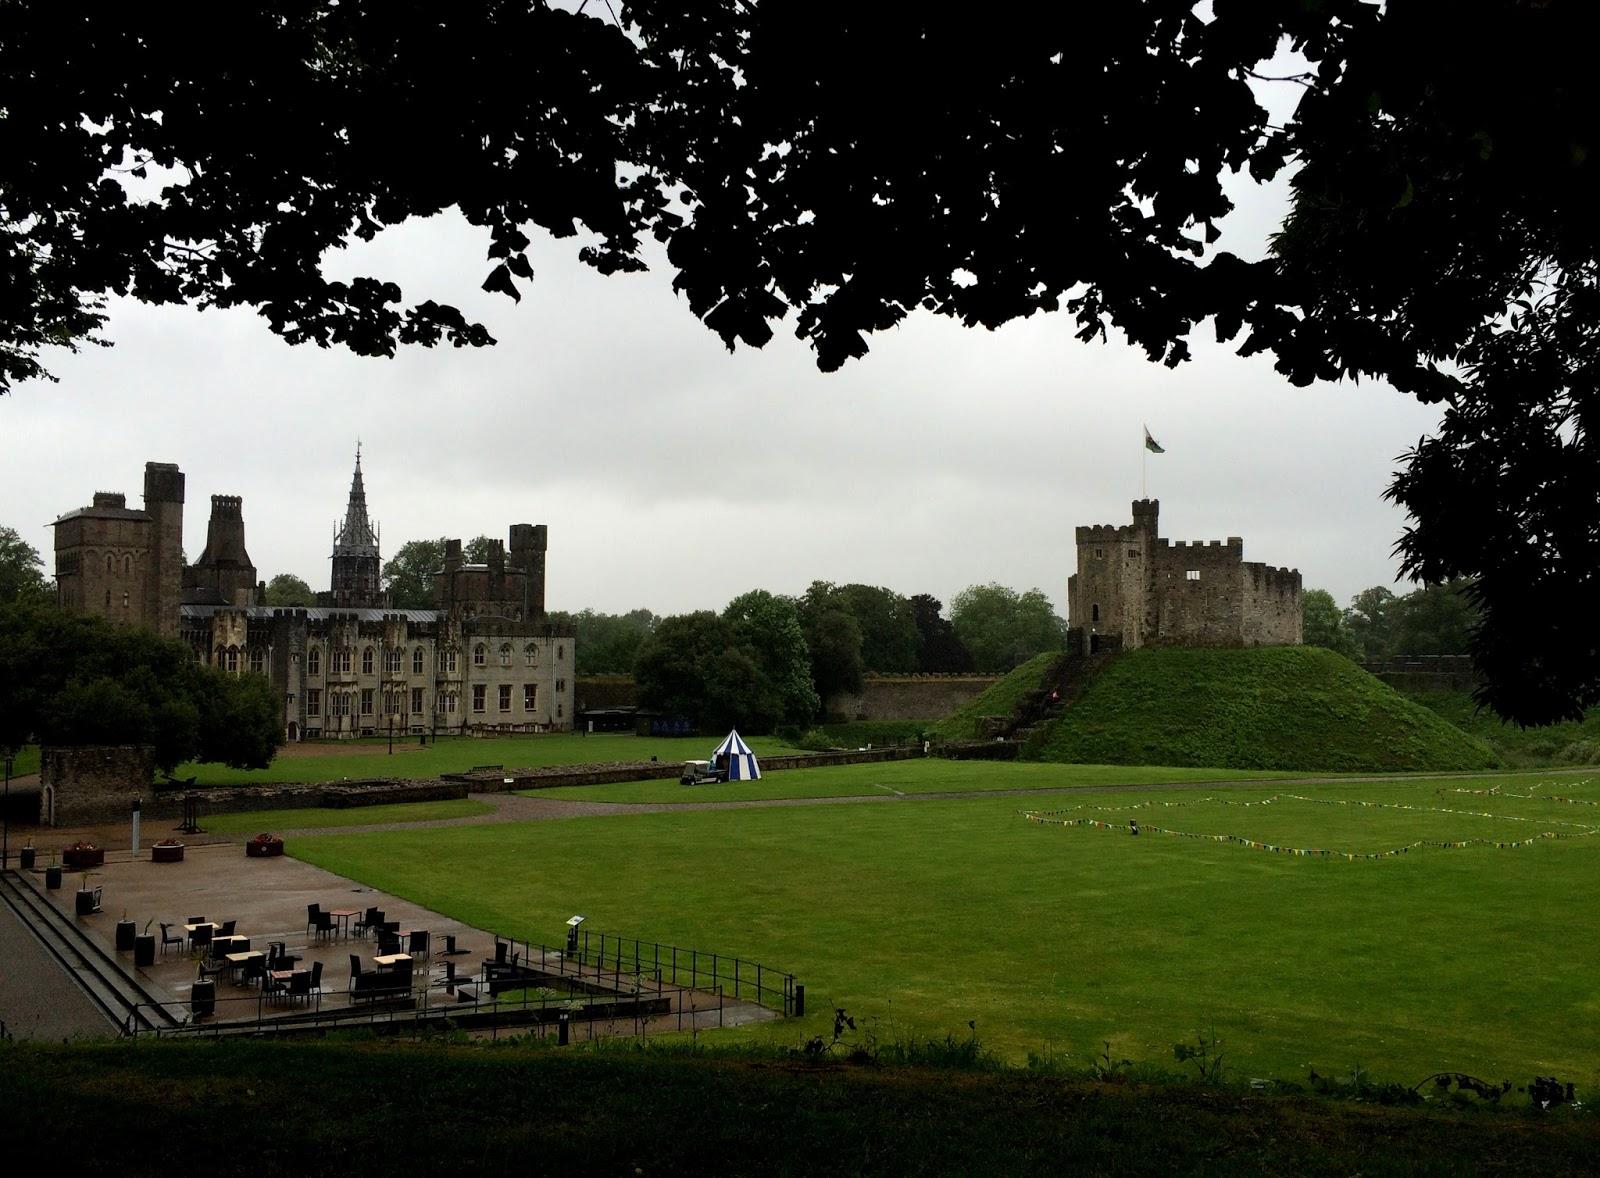 cozy birdhouse | a rainy trip to Cardiff castle